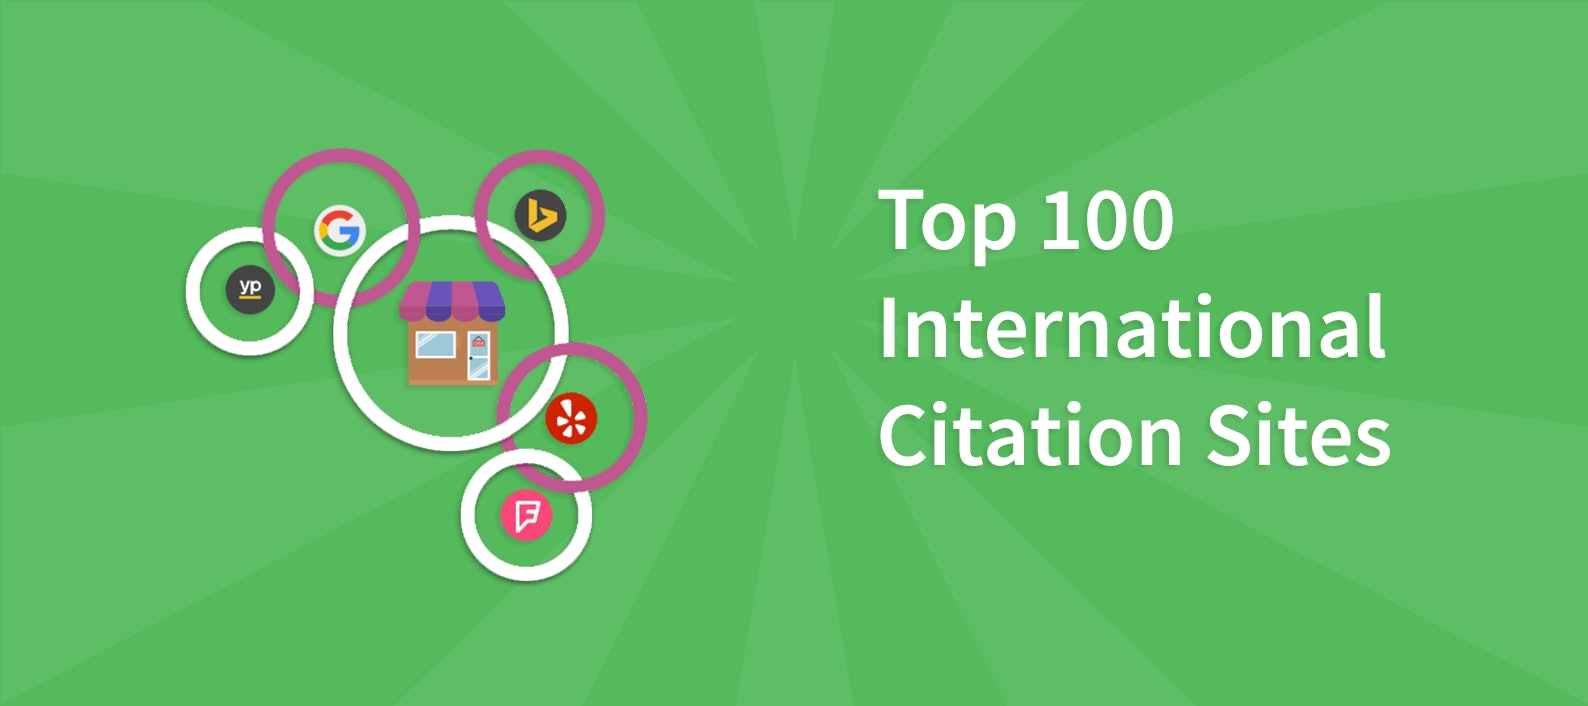 Top 100 International Citation Sites